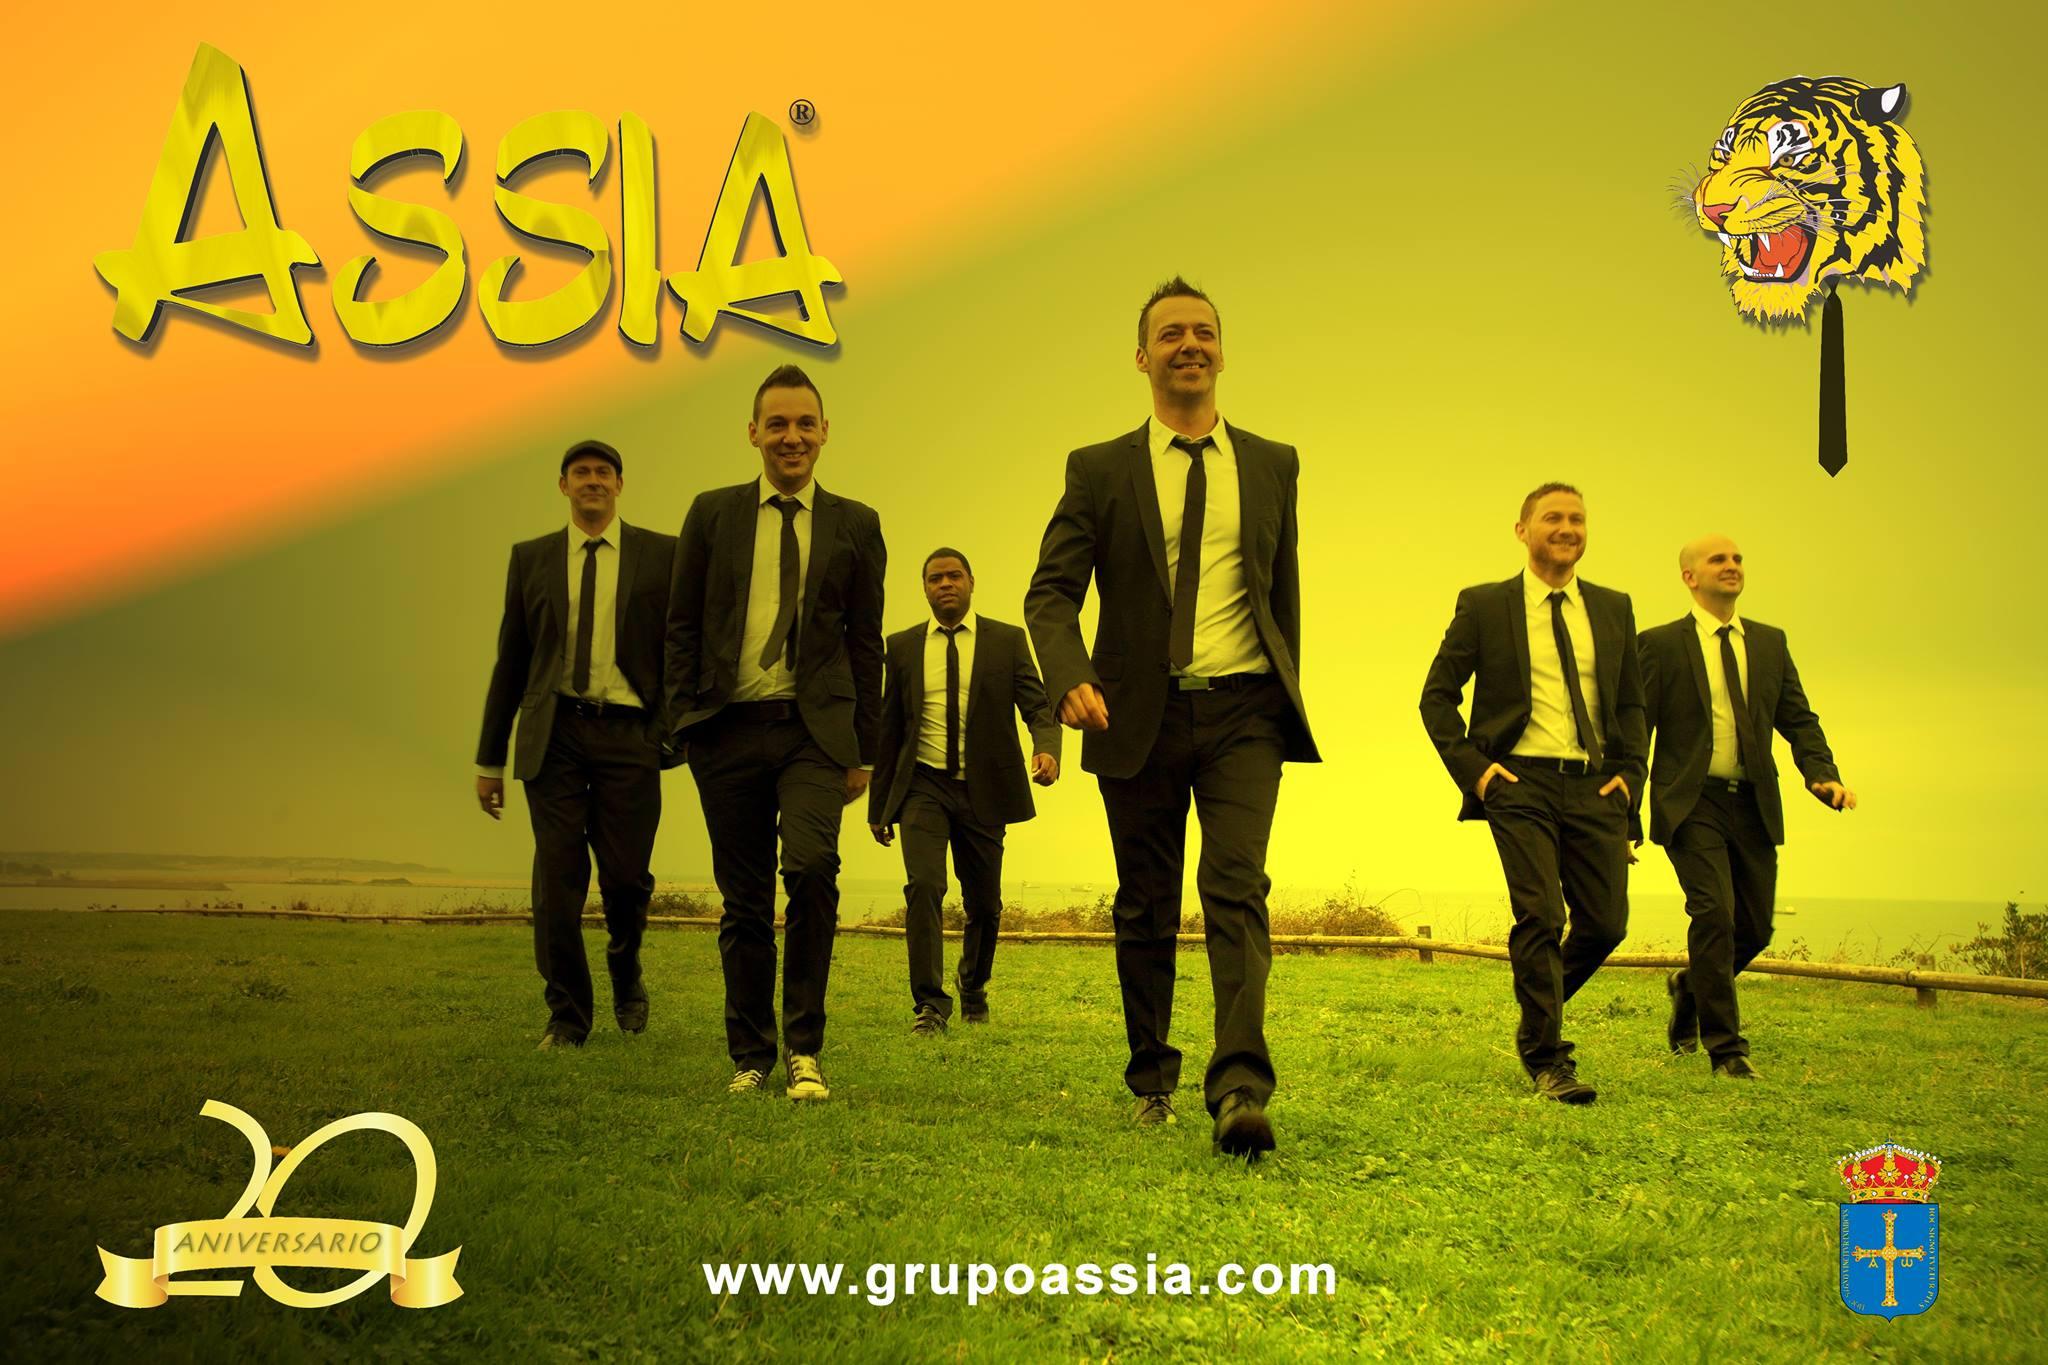 Grupo Assia